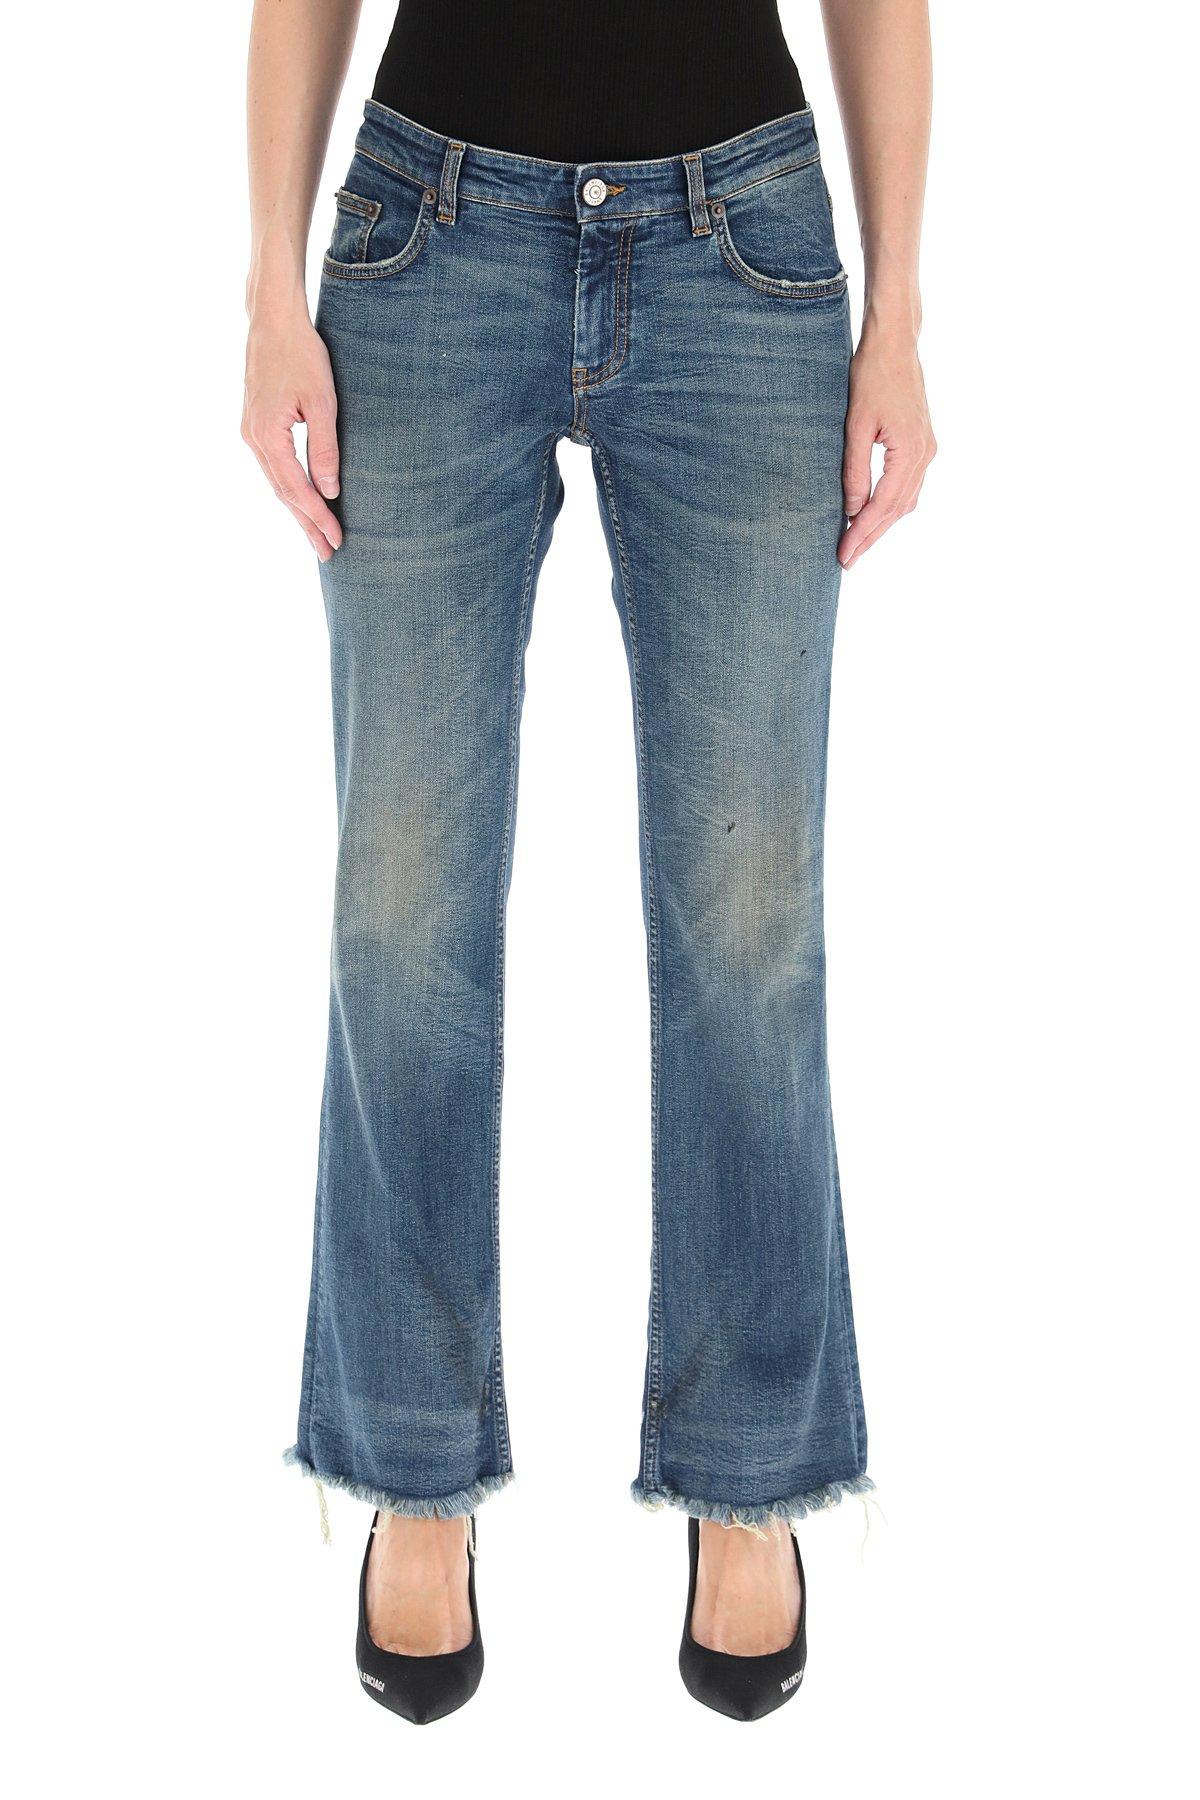 Balenciaga jeans flared cropped